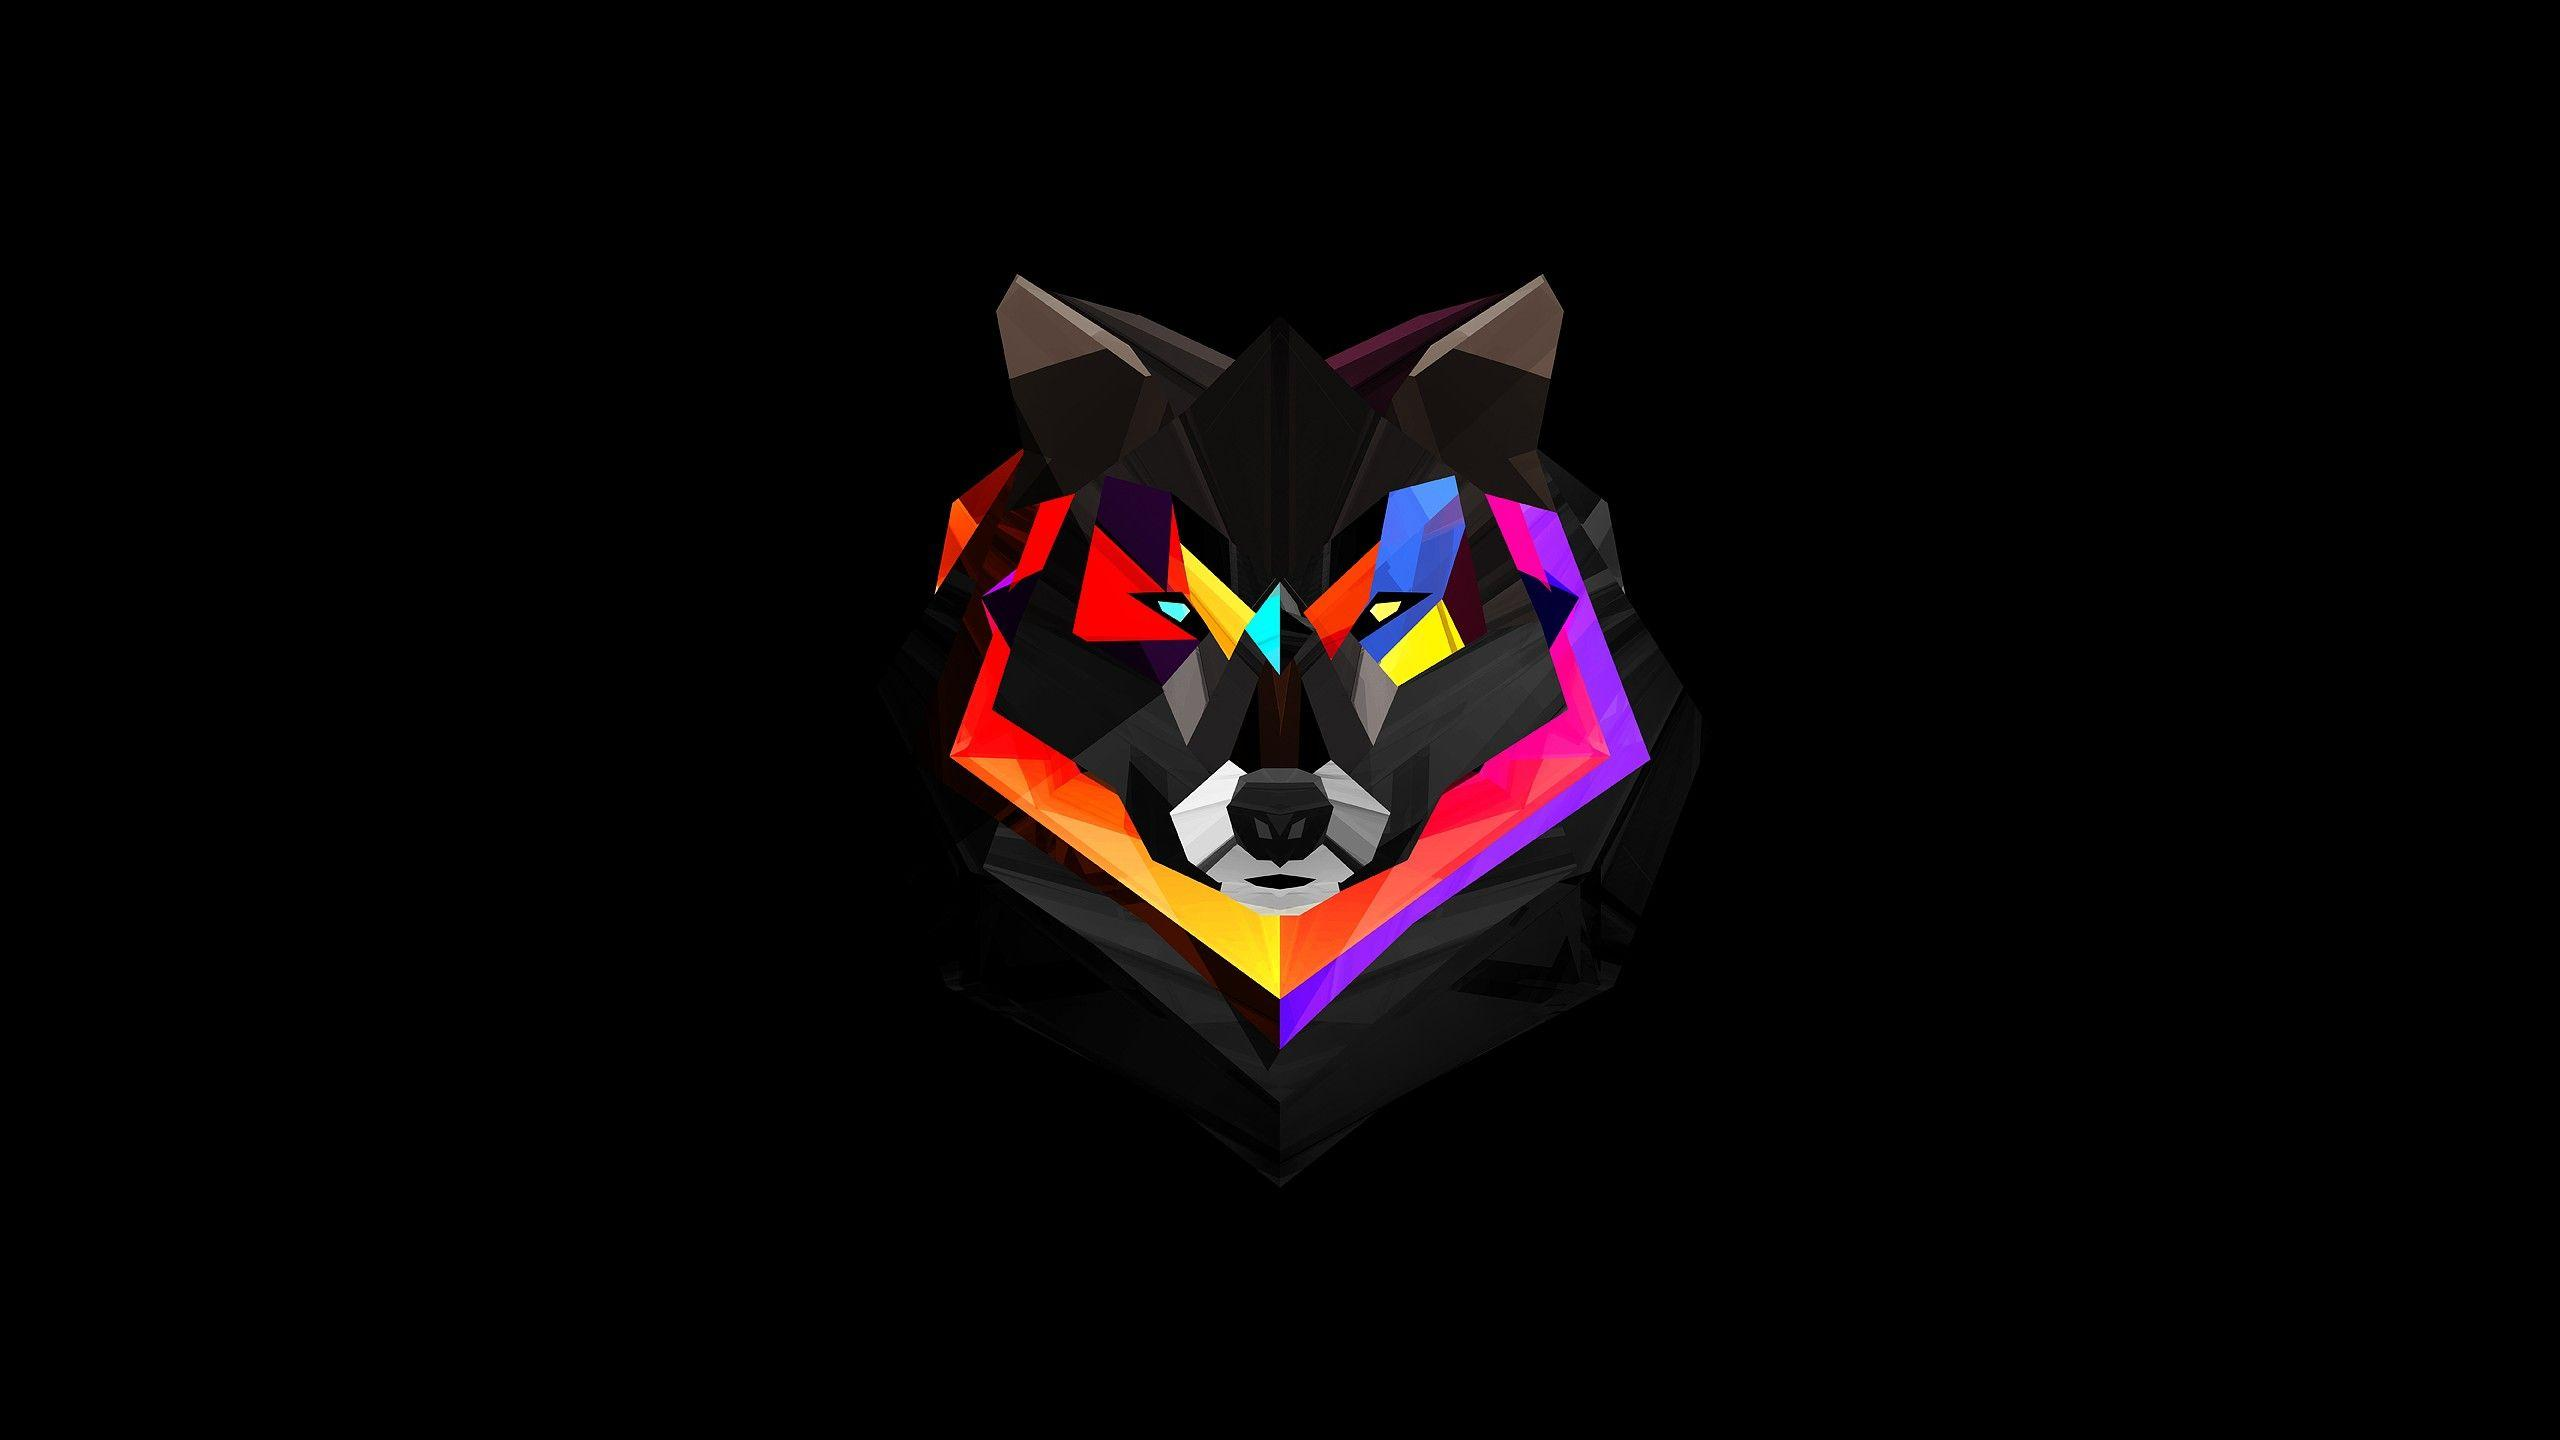 Wallpaper wolf poligon for Sfondi 4k per pc